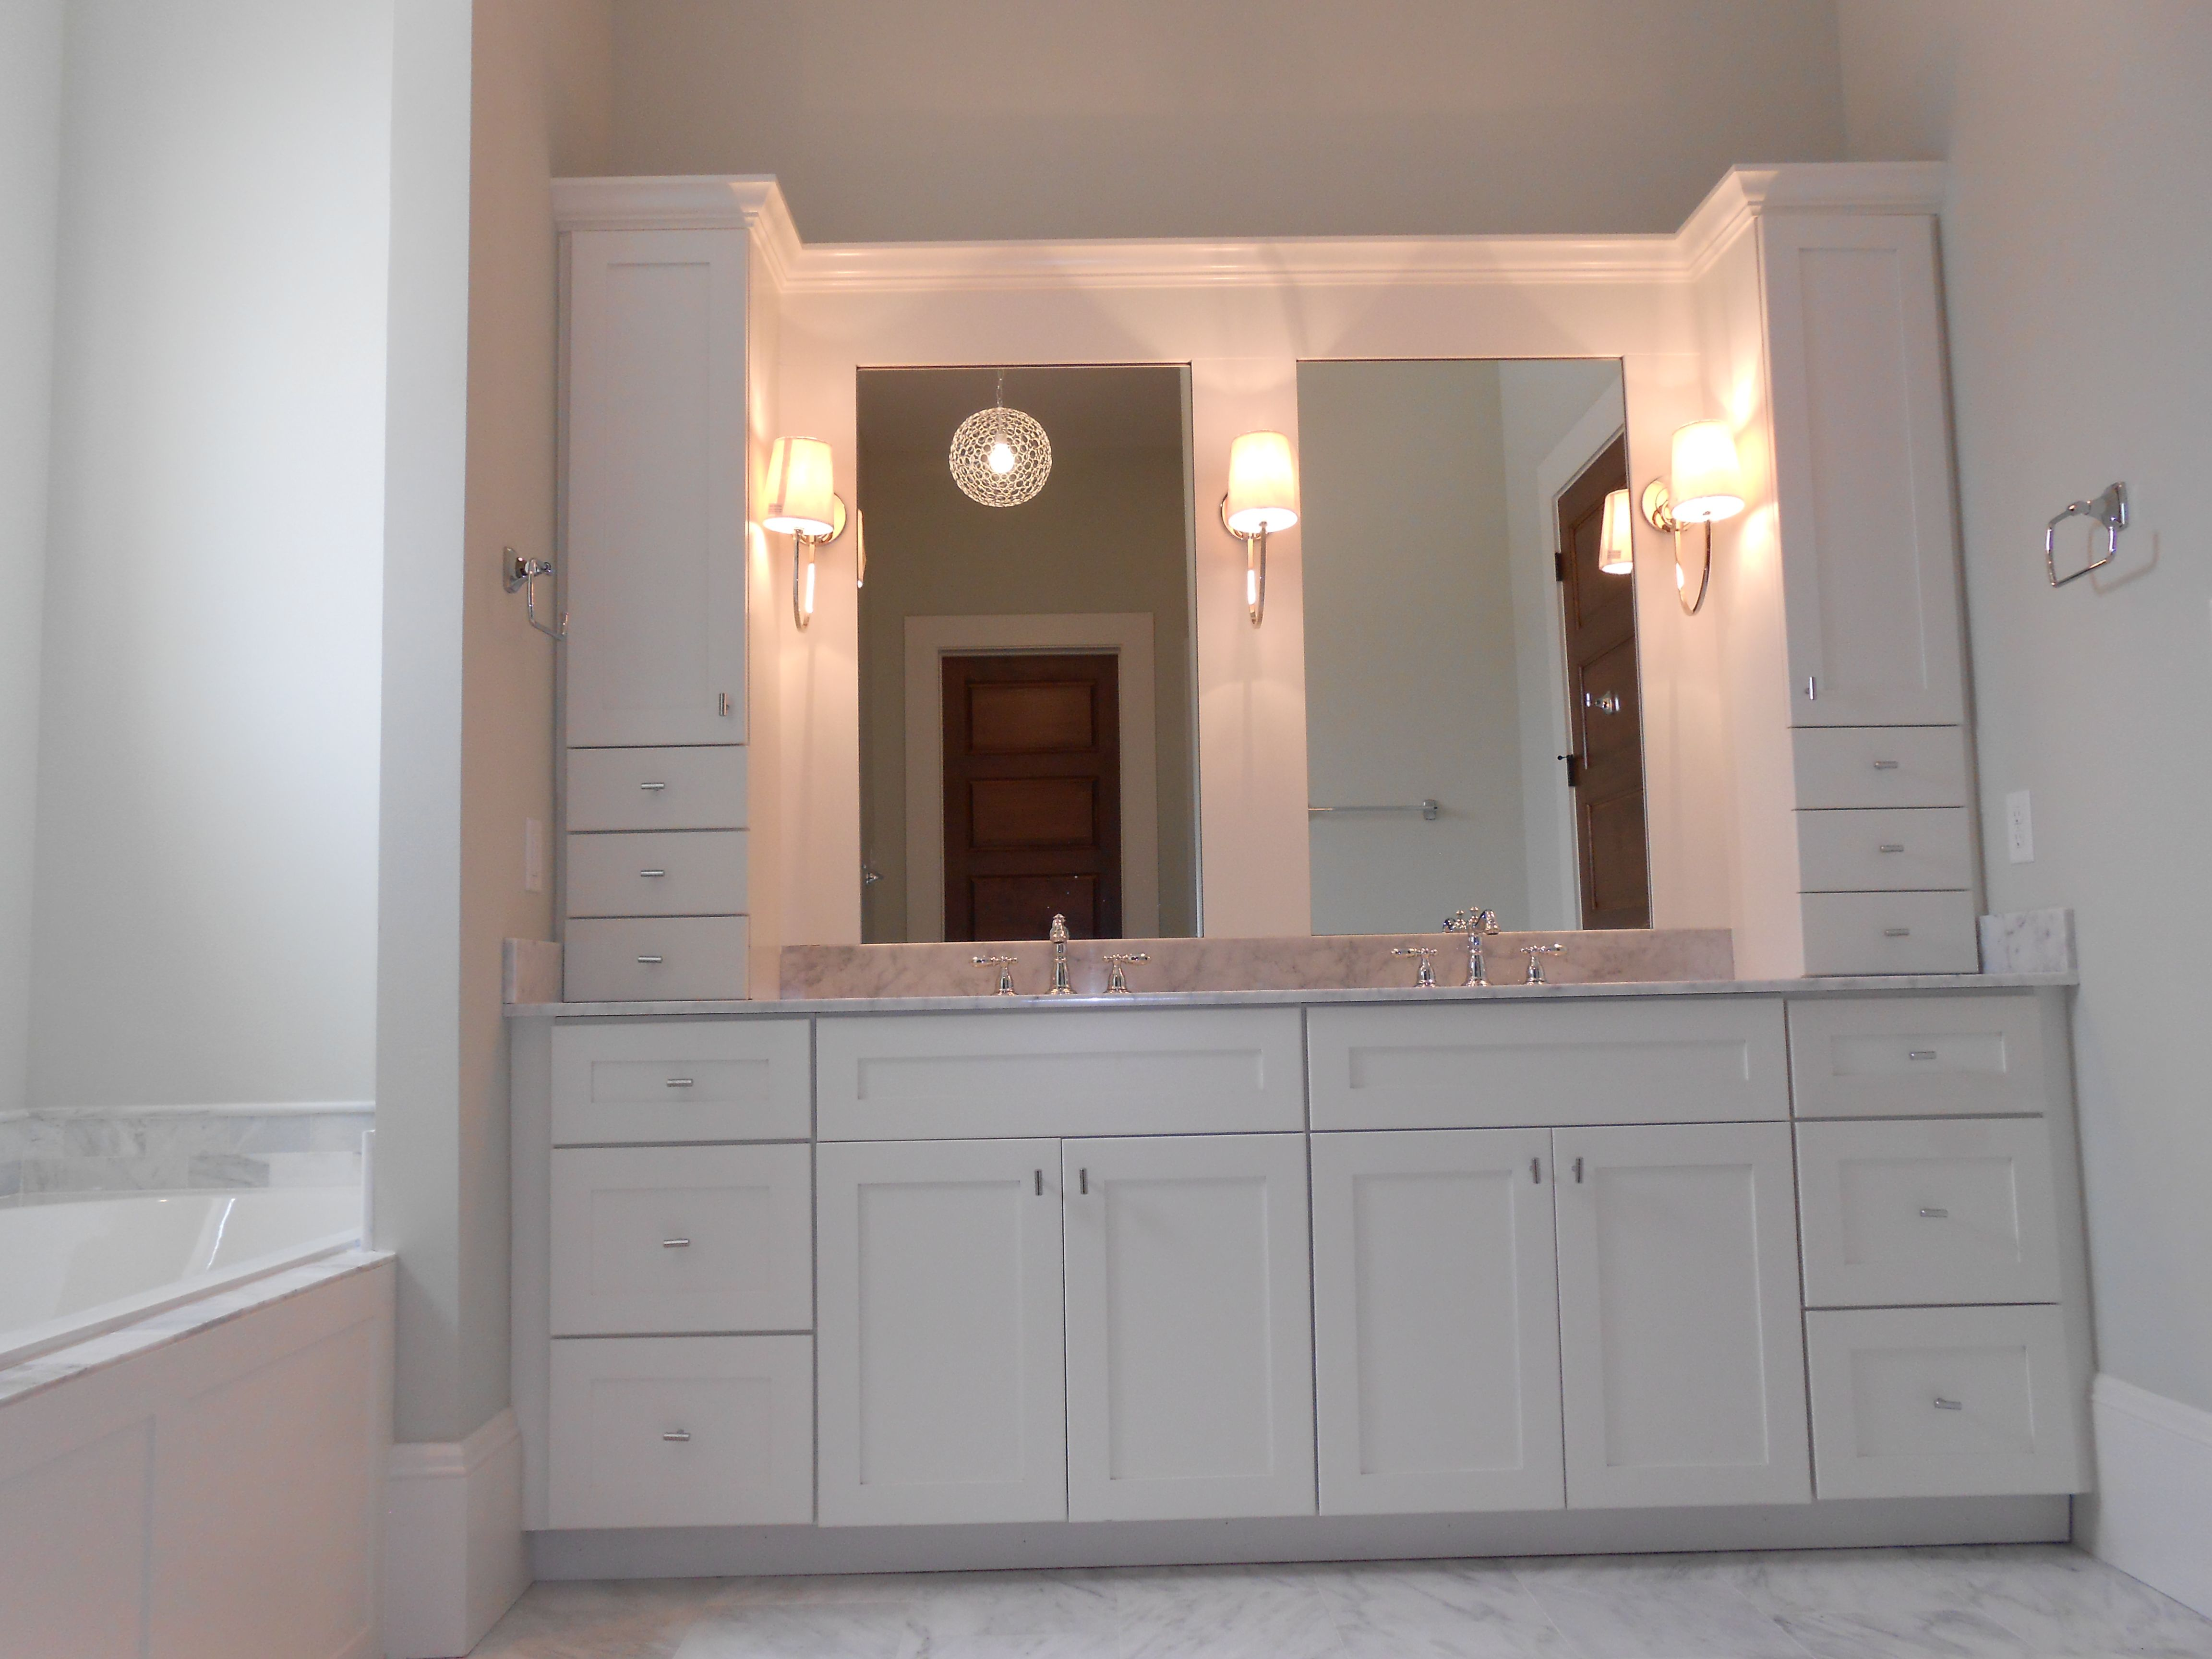 home sink new solutions various cabinetry custom cabinets built portfolio advent renovation finishing bathroom img vanity